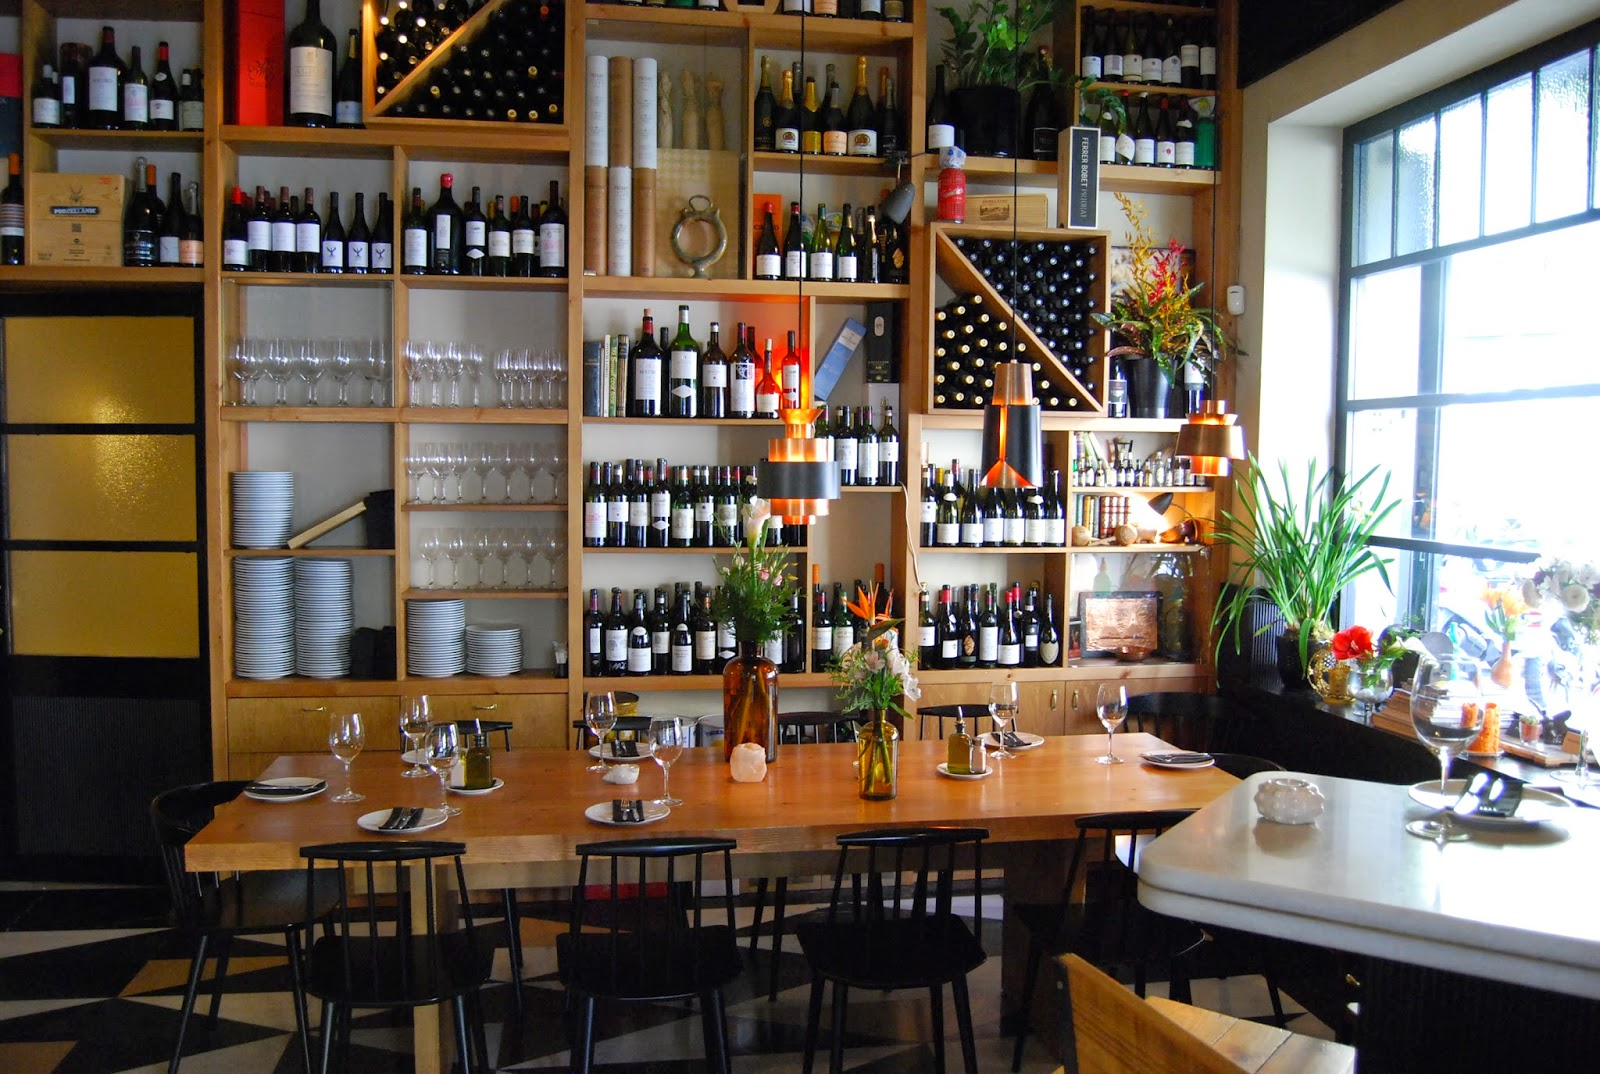 Brillat savarin mont bar - Estanterias para bares ...